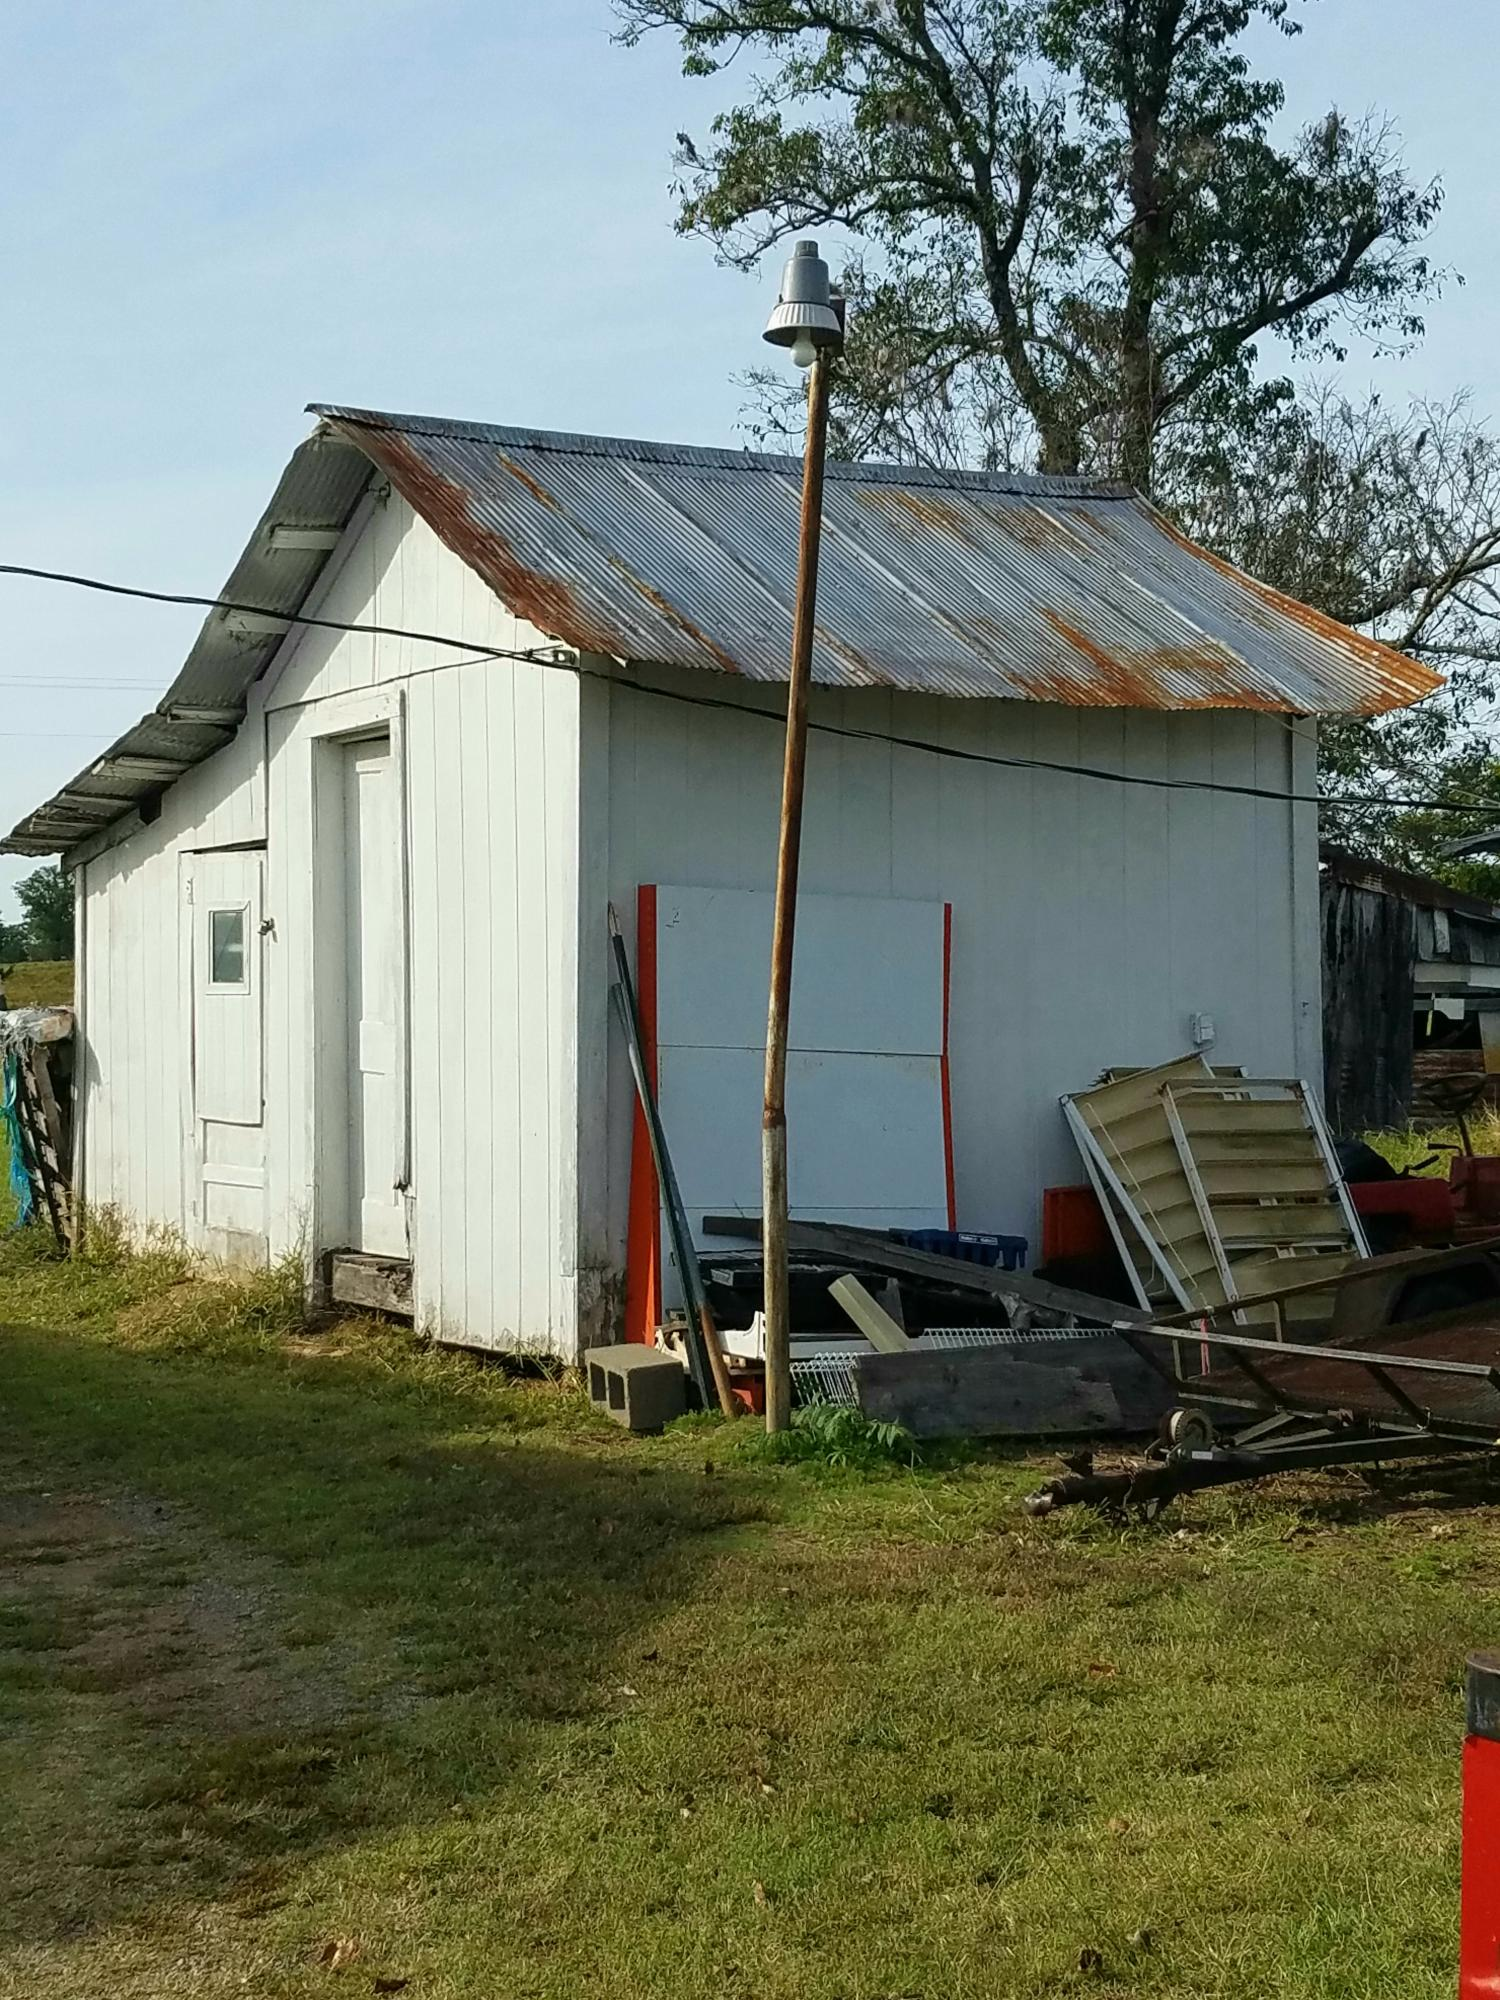 Main photo 2 of sold home in Hartman at 7228  Hwy 64 , Hartman, AR 72830